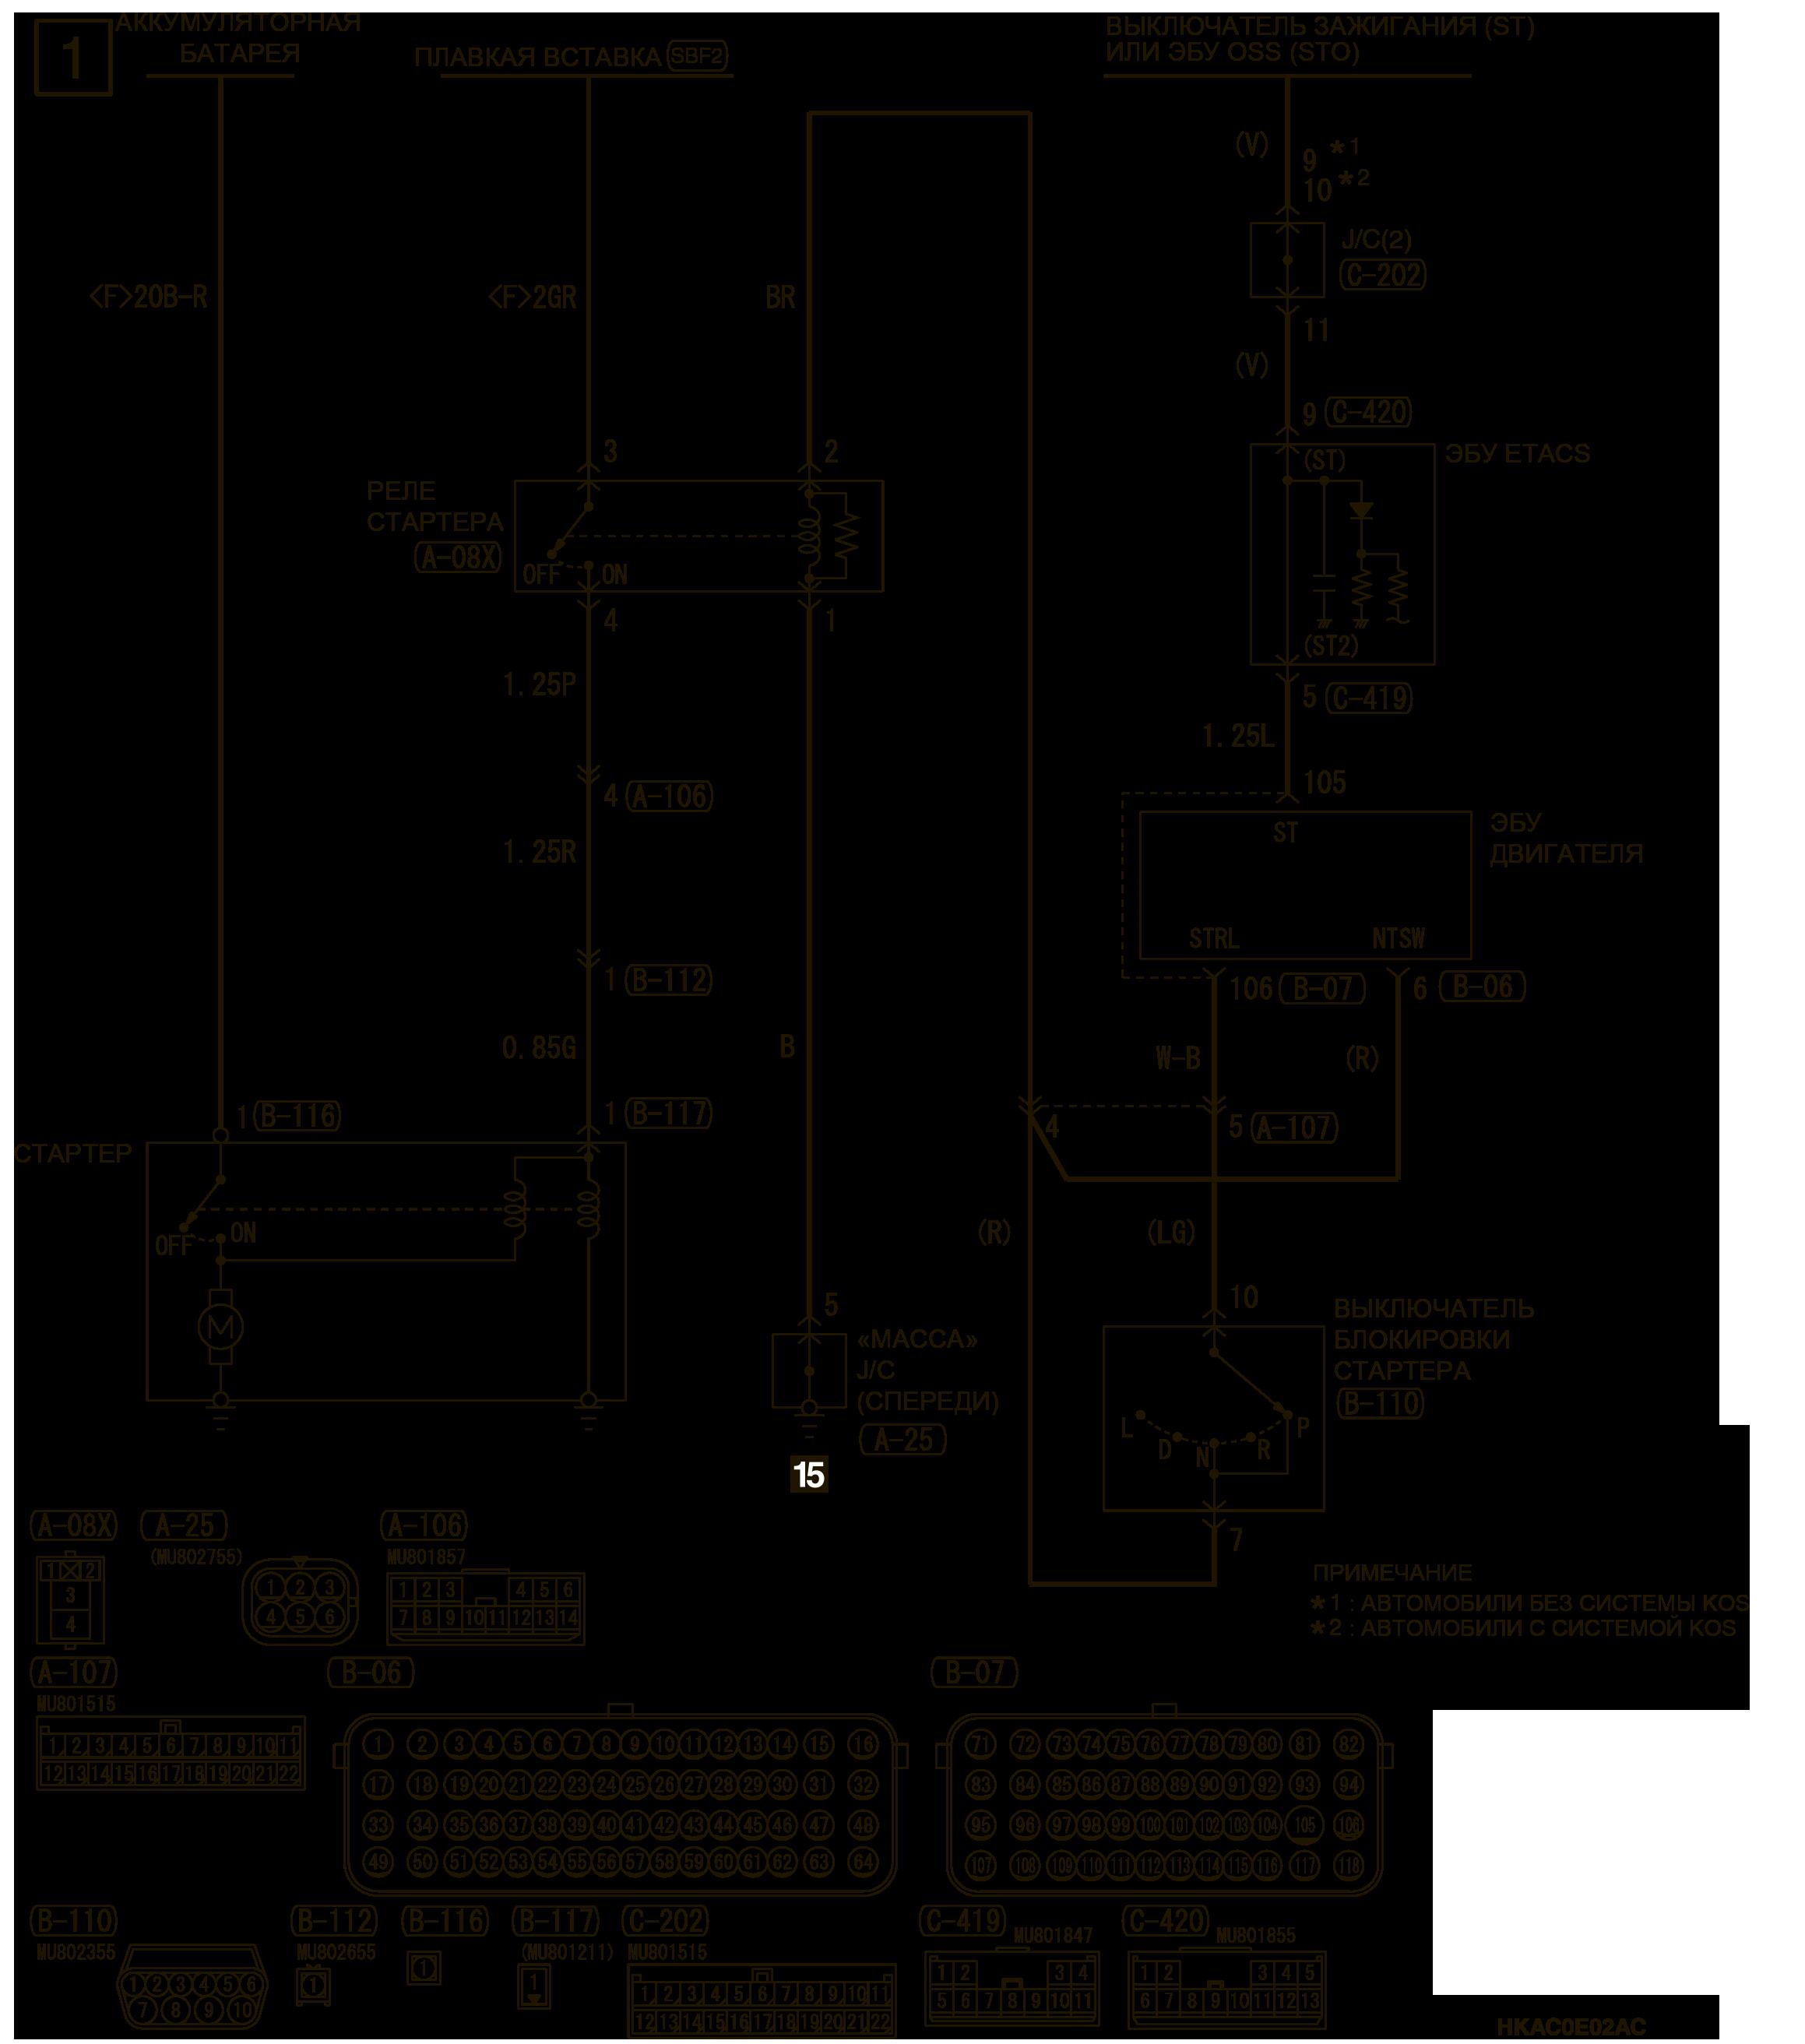 mmc аутлендер 3 2019 электросхемаСИСТЕМА ЭЛЕКТРОПУСКА 4B1, 4J1-CVT (АВТОМОБИЛИ БЕЗ СИСТЕМЫ AS&G)